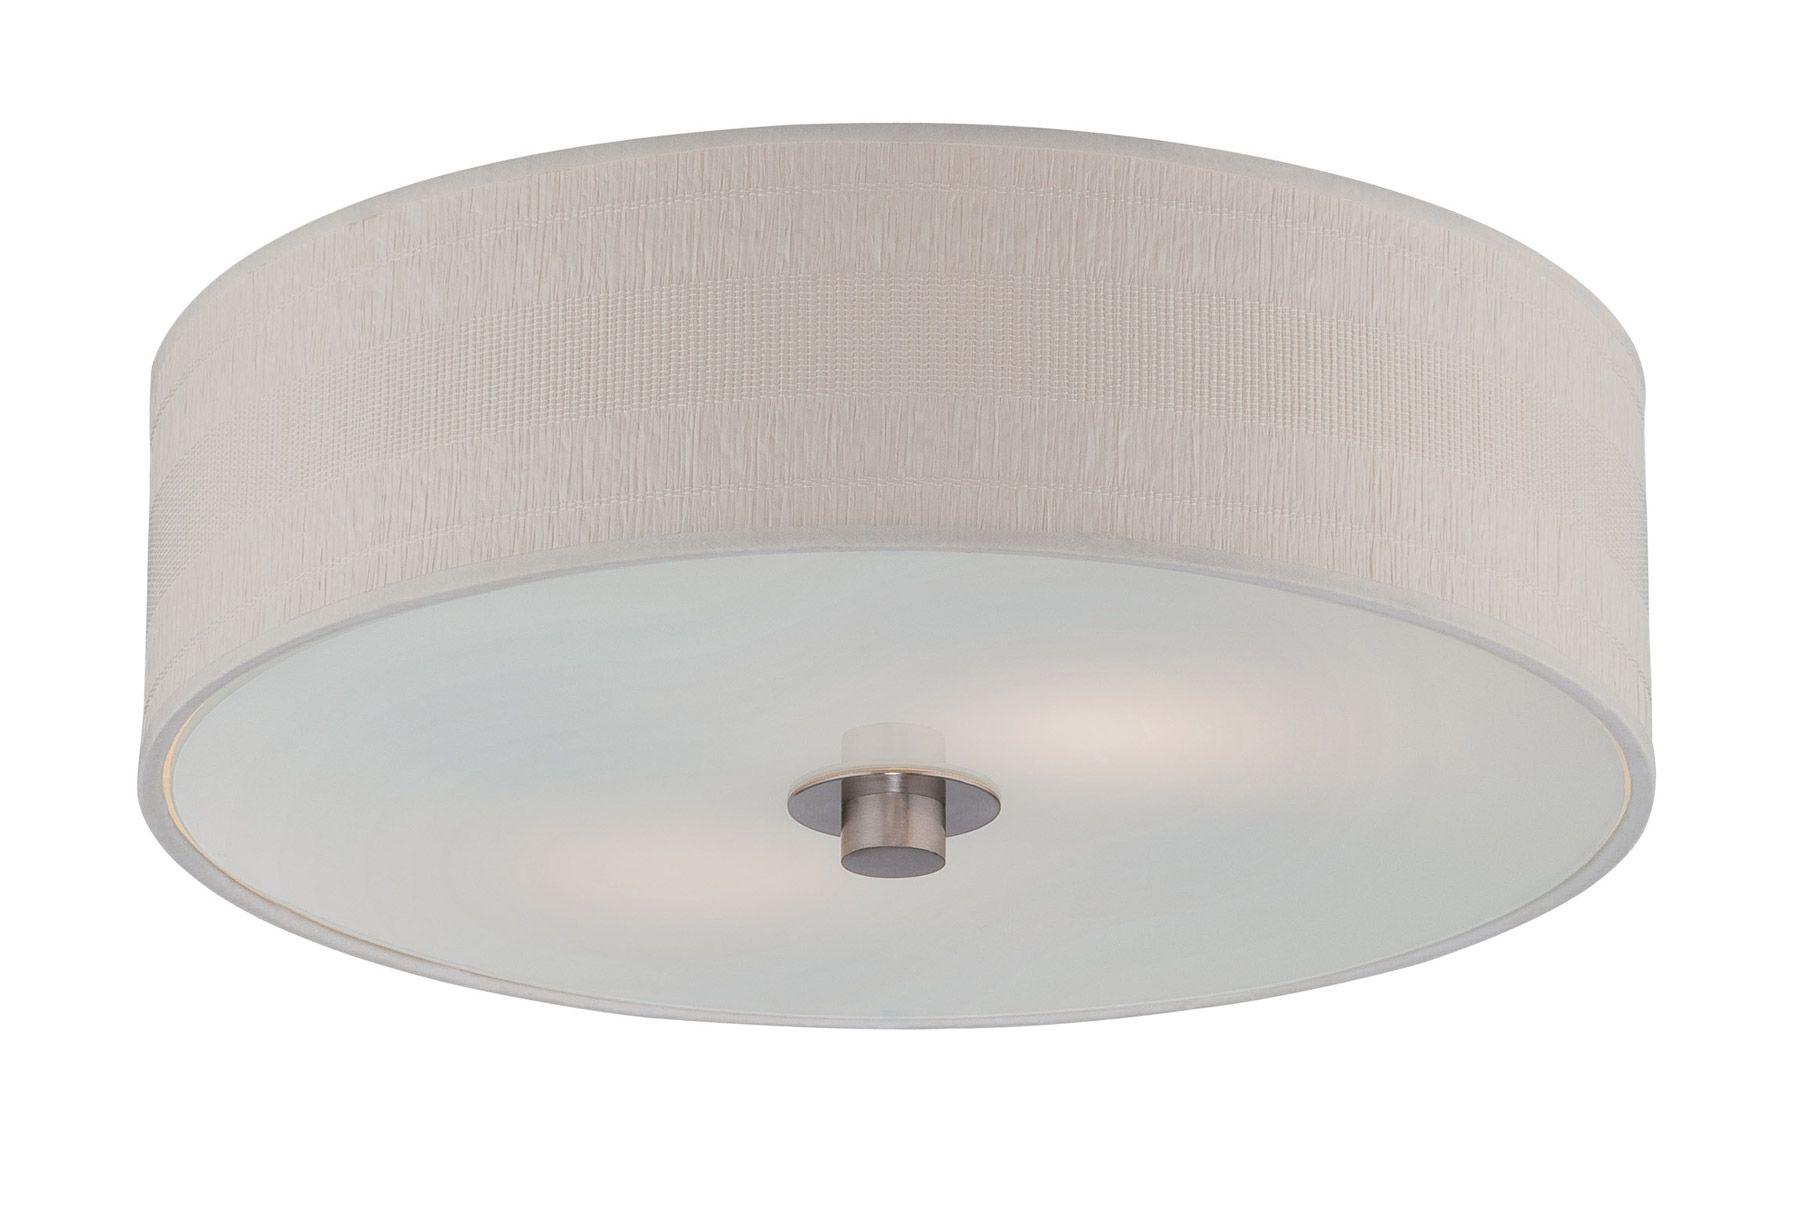 Ceiling mount light fixture home lighting ideas